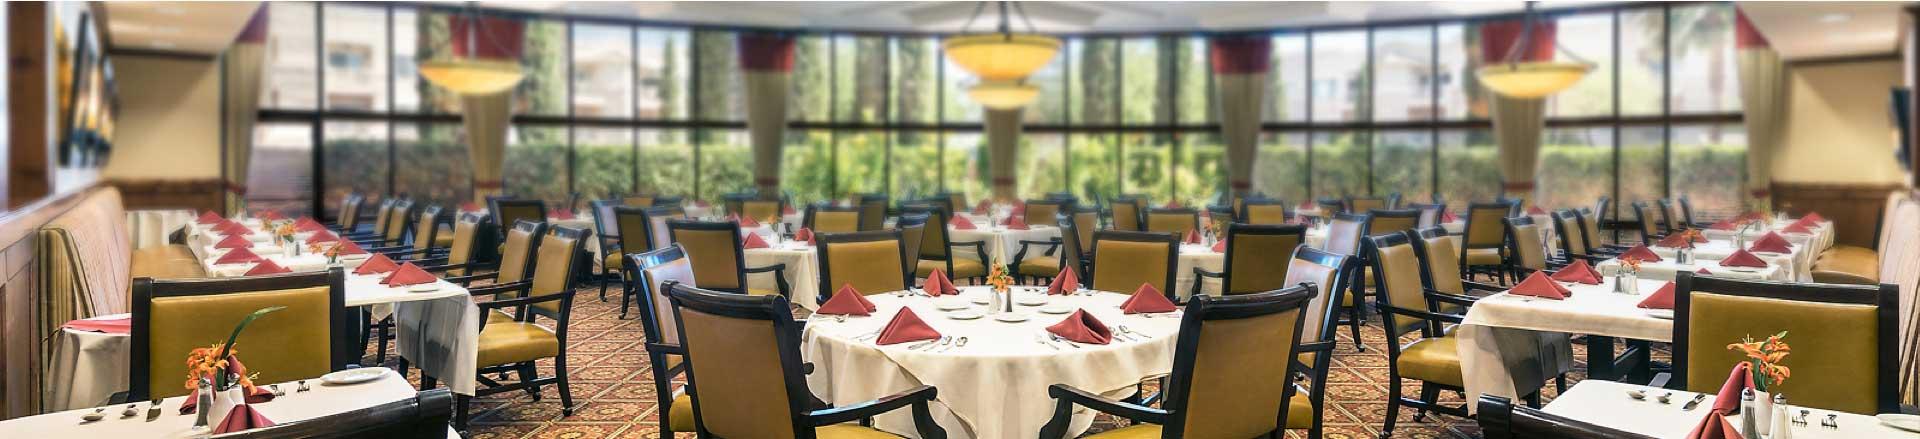 Dining Programs Robson Reserve at Sun Lakes